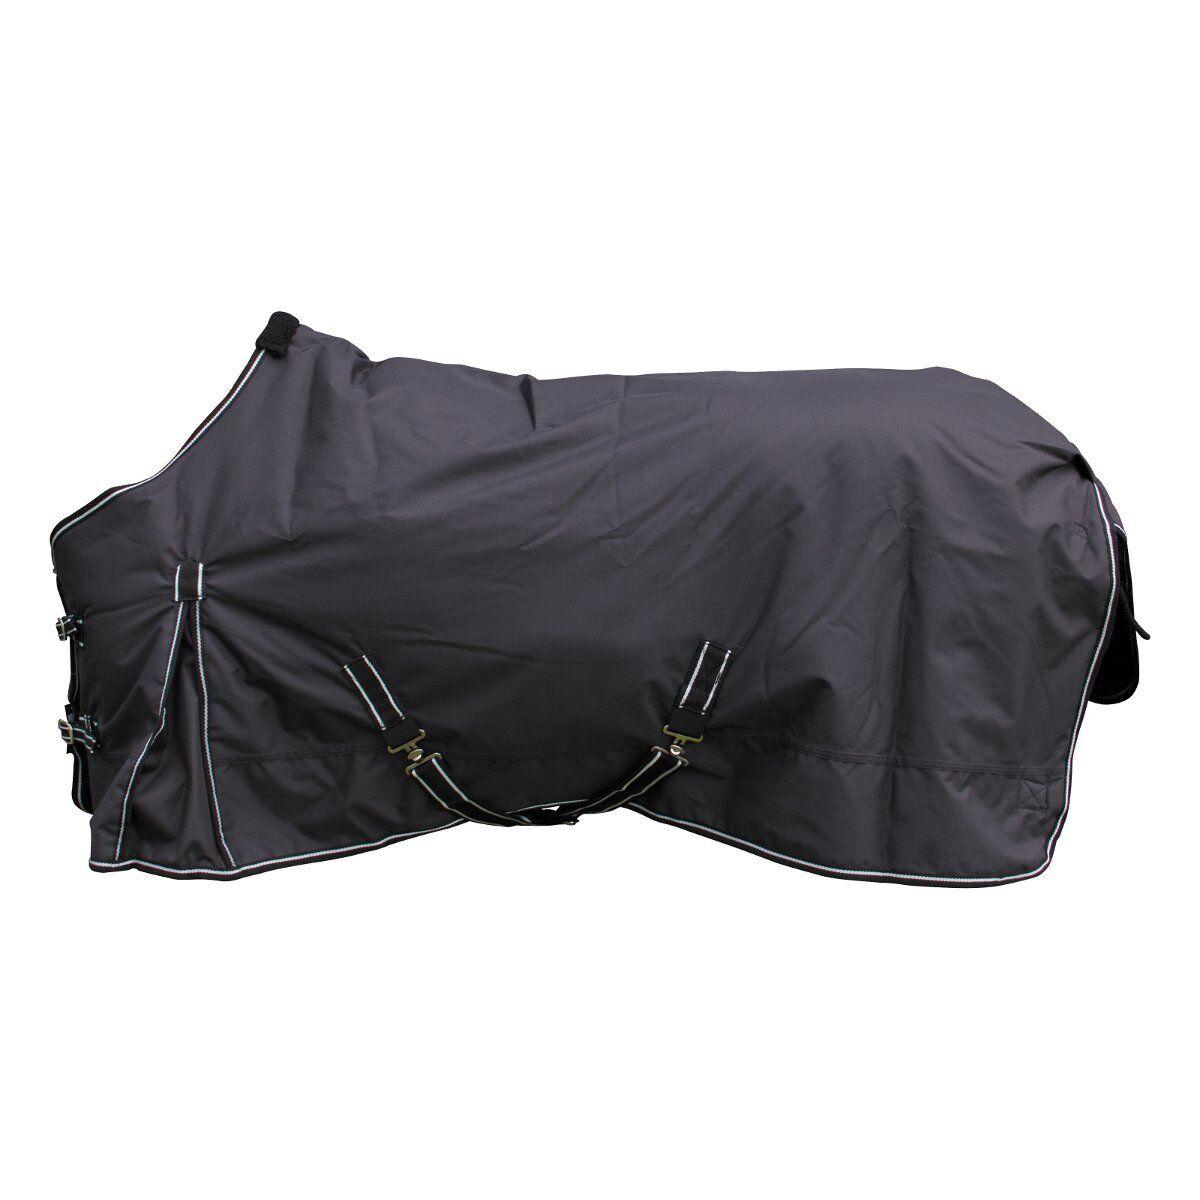 Eldorado invierno manta para caballos, 300 G-negro - 115 cm manta Pony Pony manta